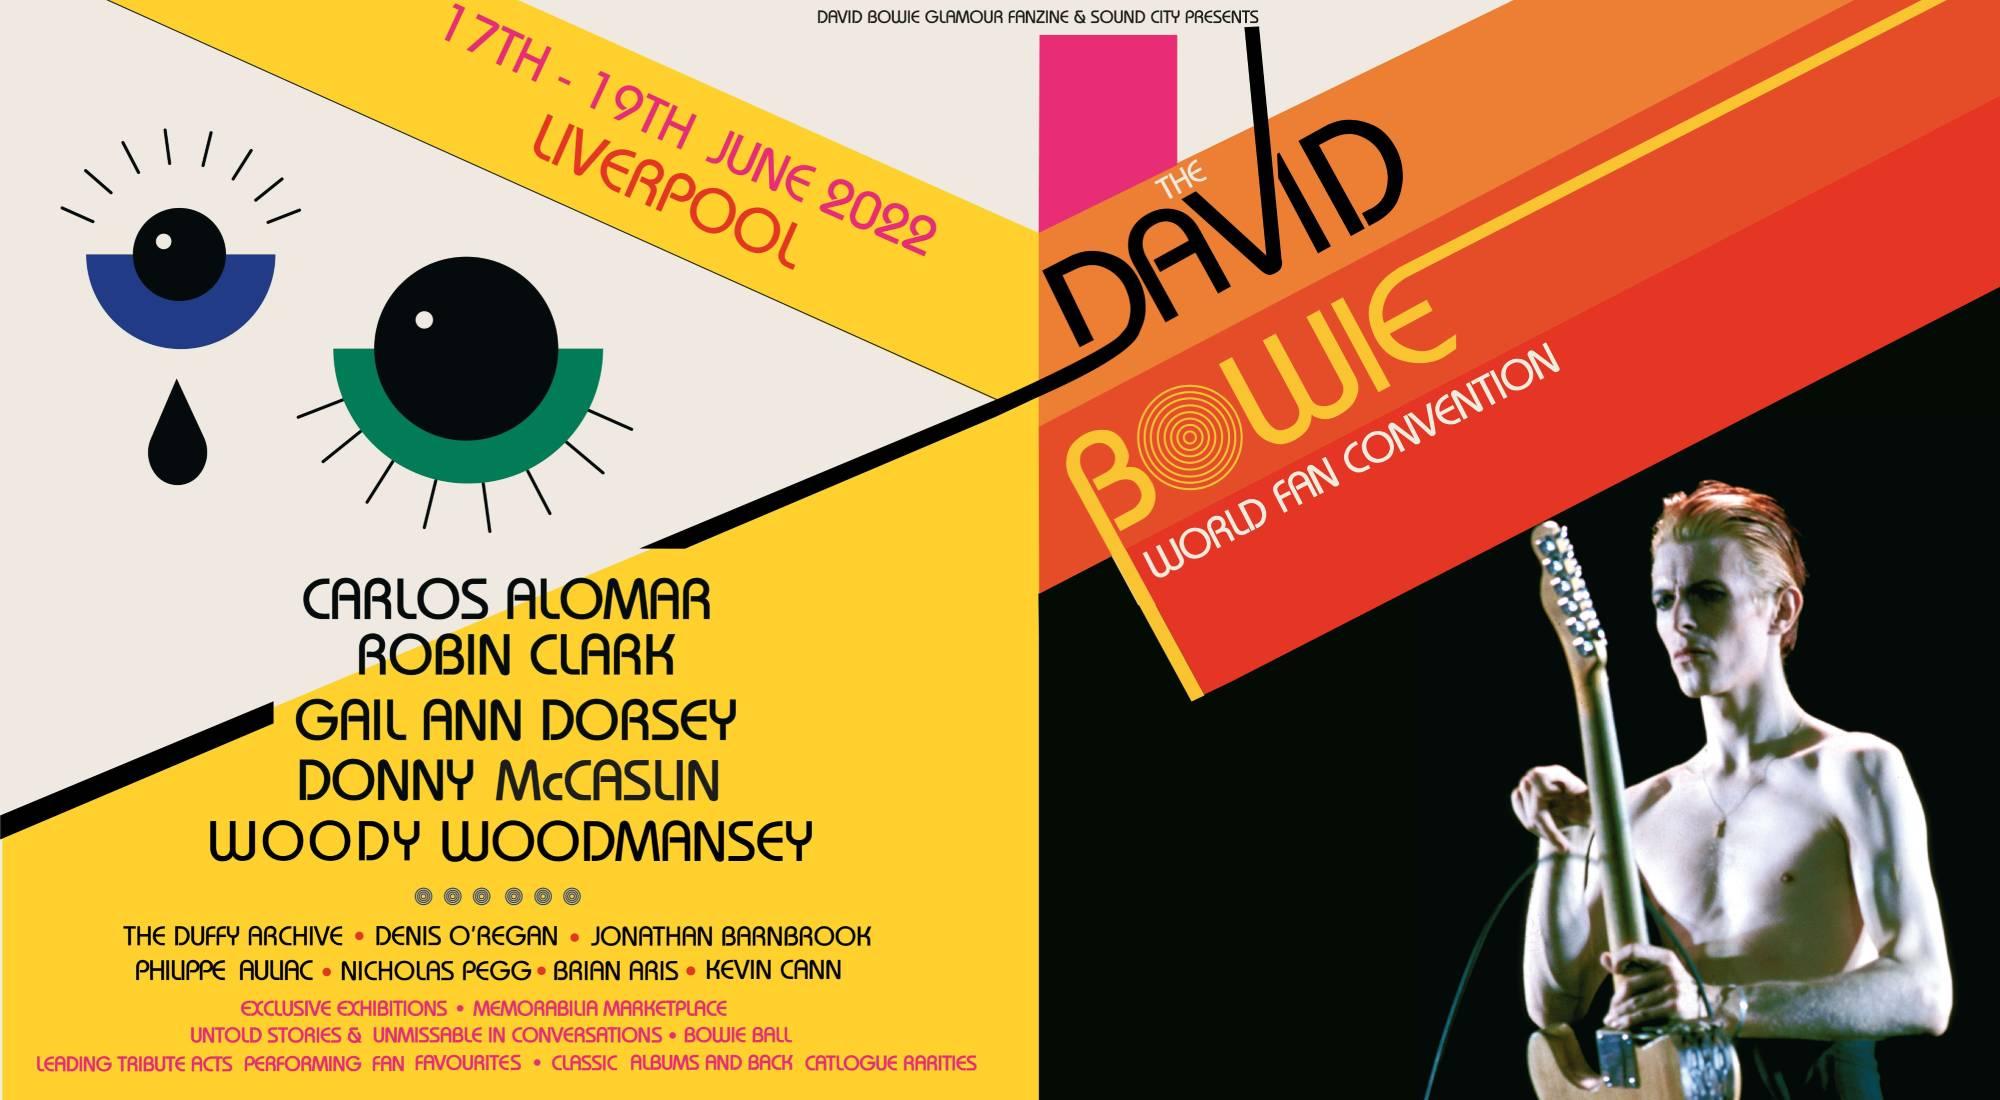 David Bowie convention